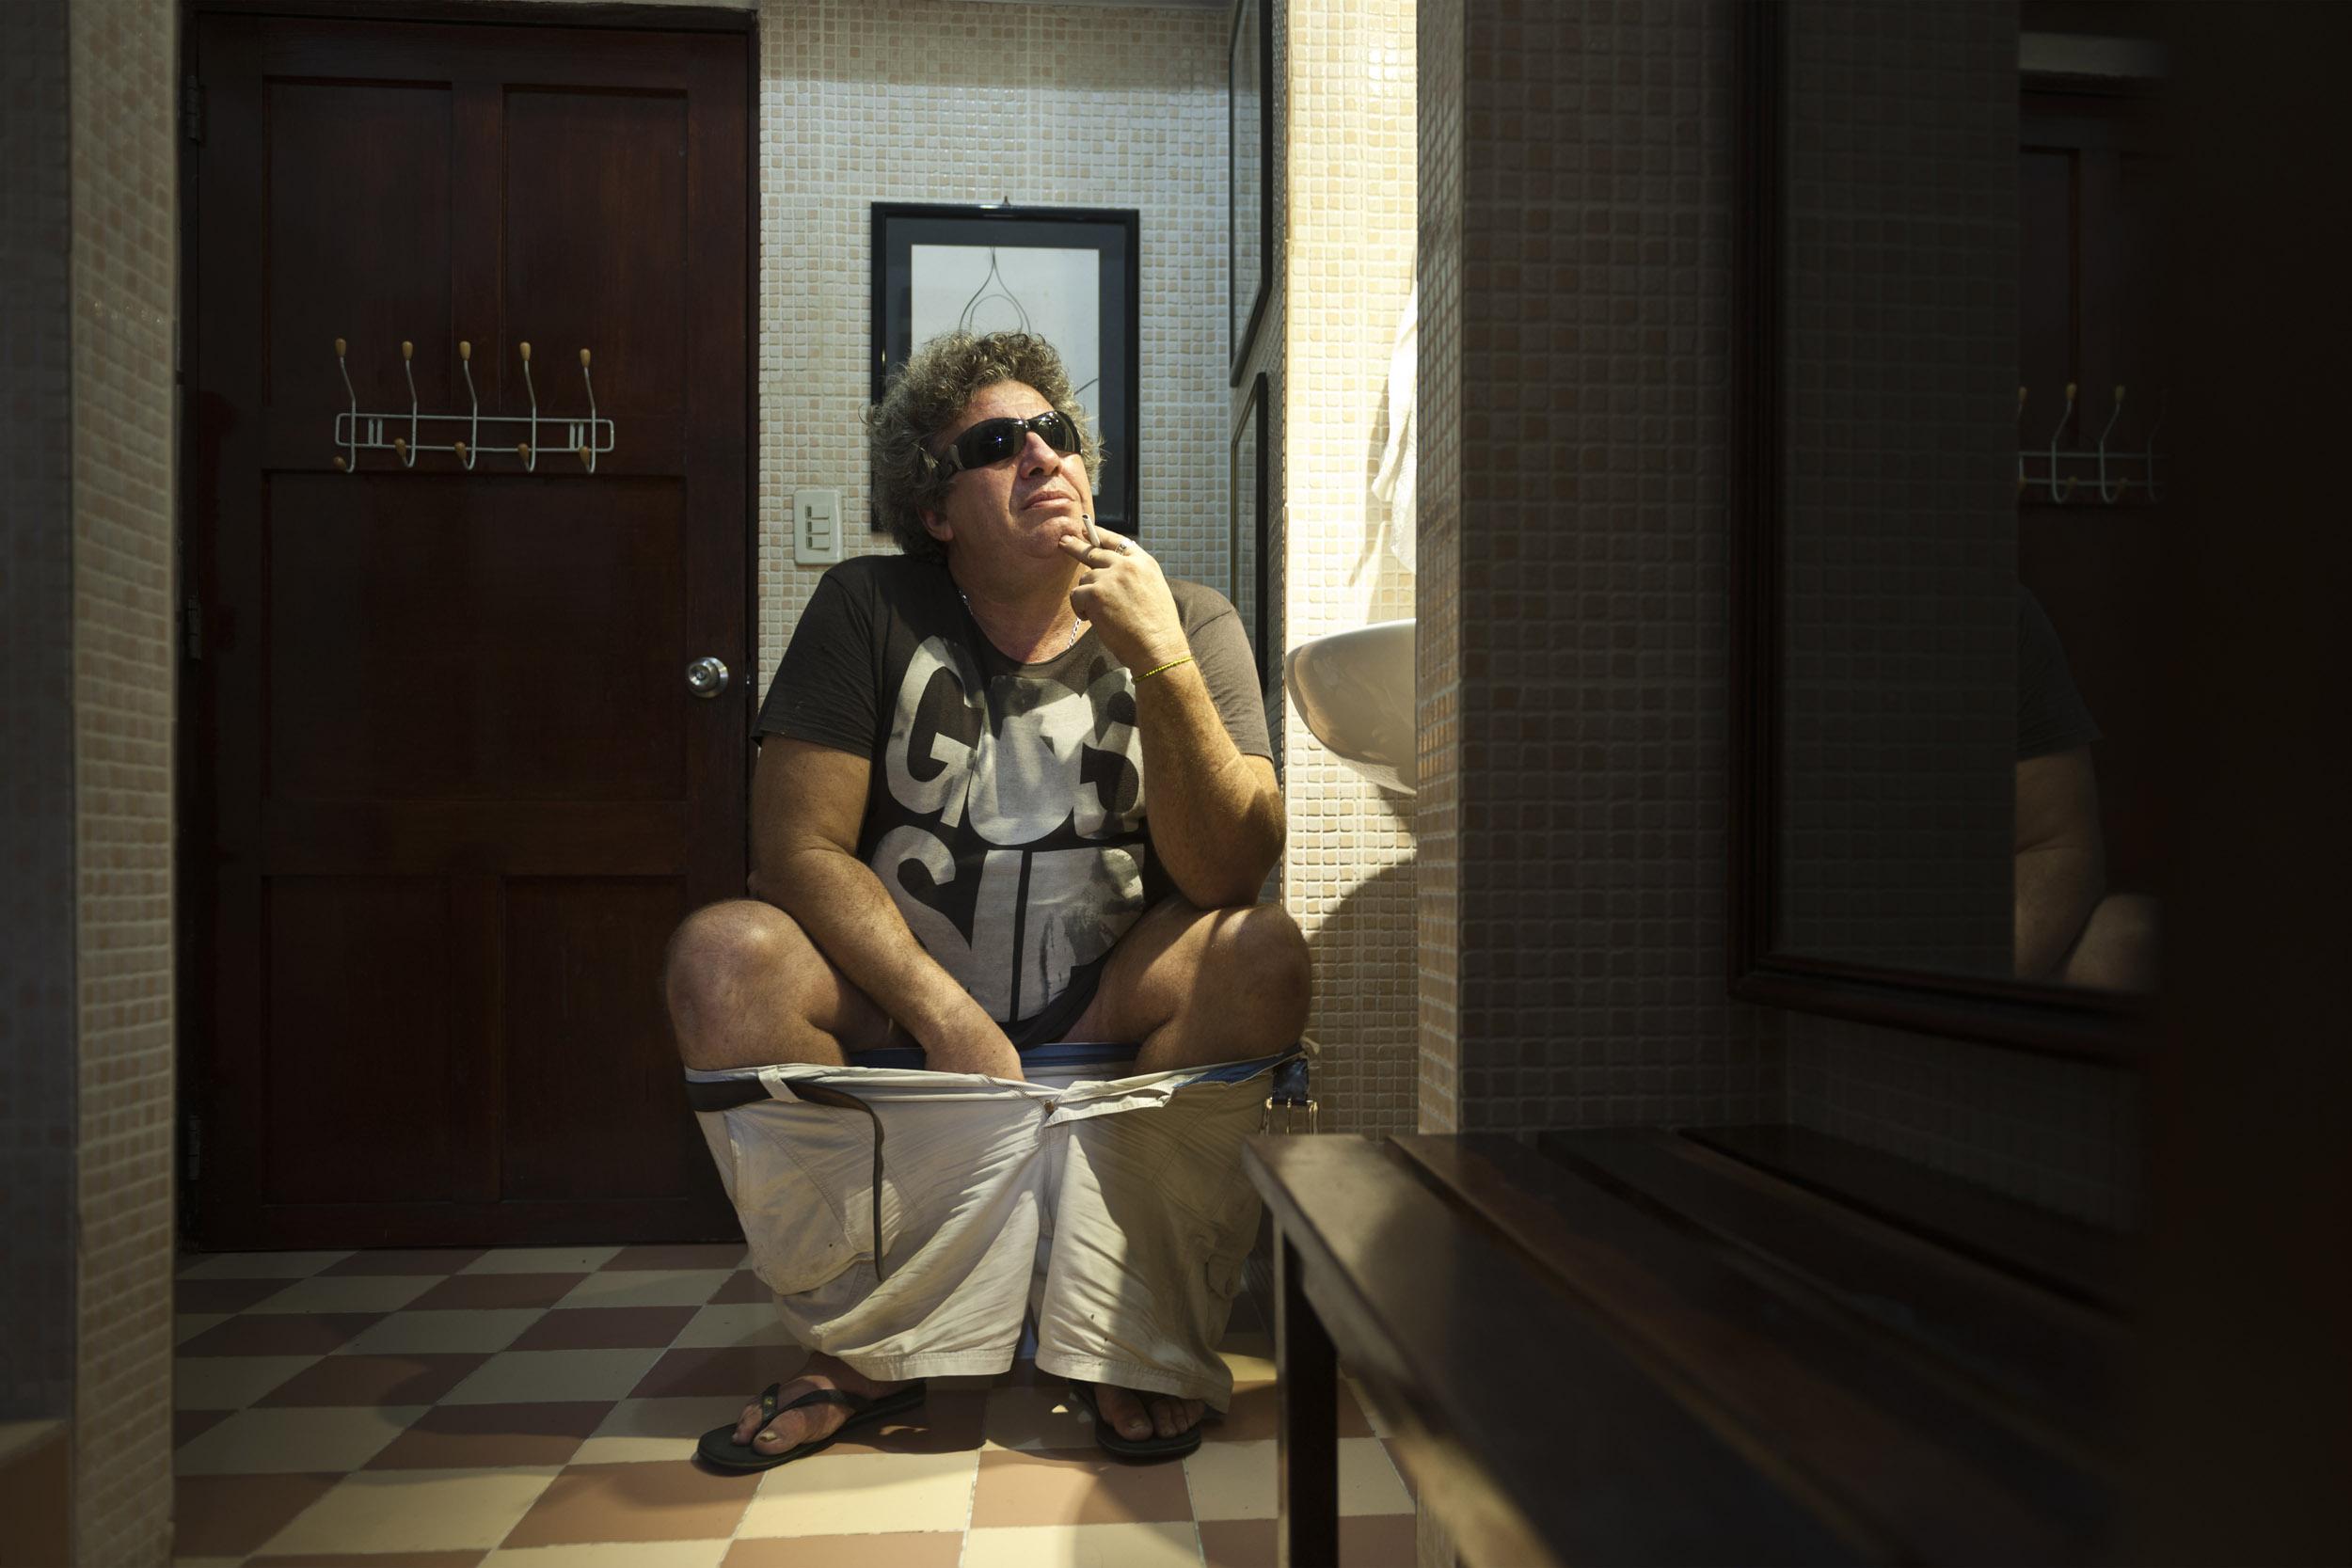 Cuty Ragazzone, painter - Illuminated Cuba - Hector Garrido, Aerial and human photography